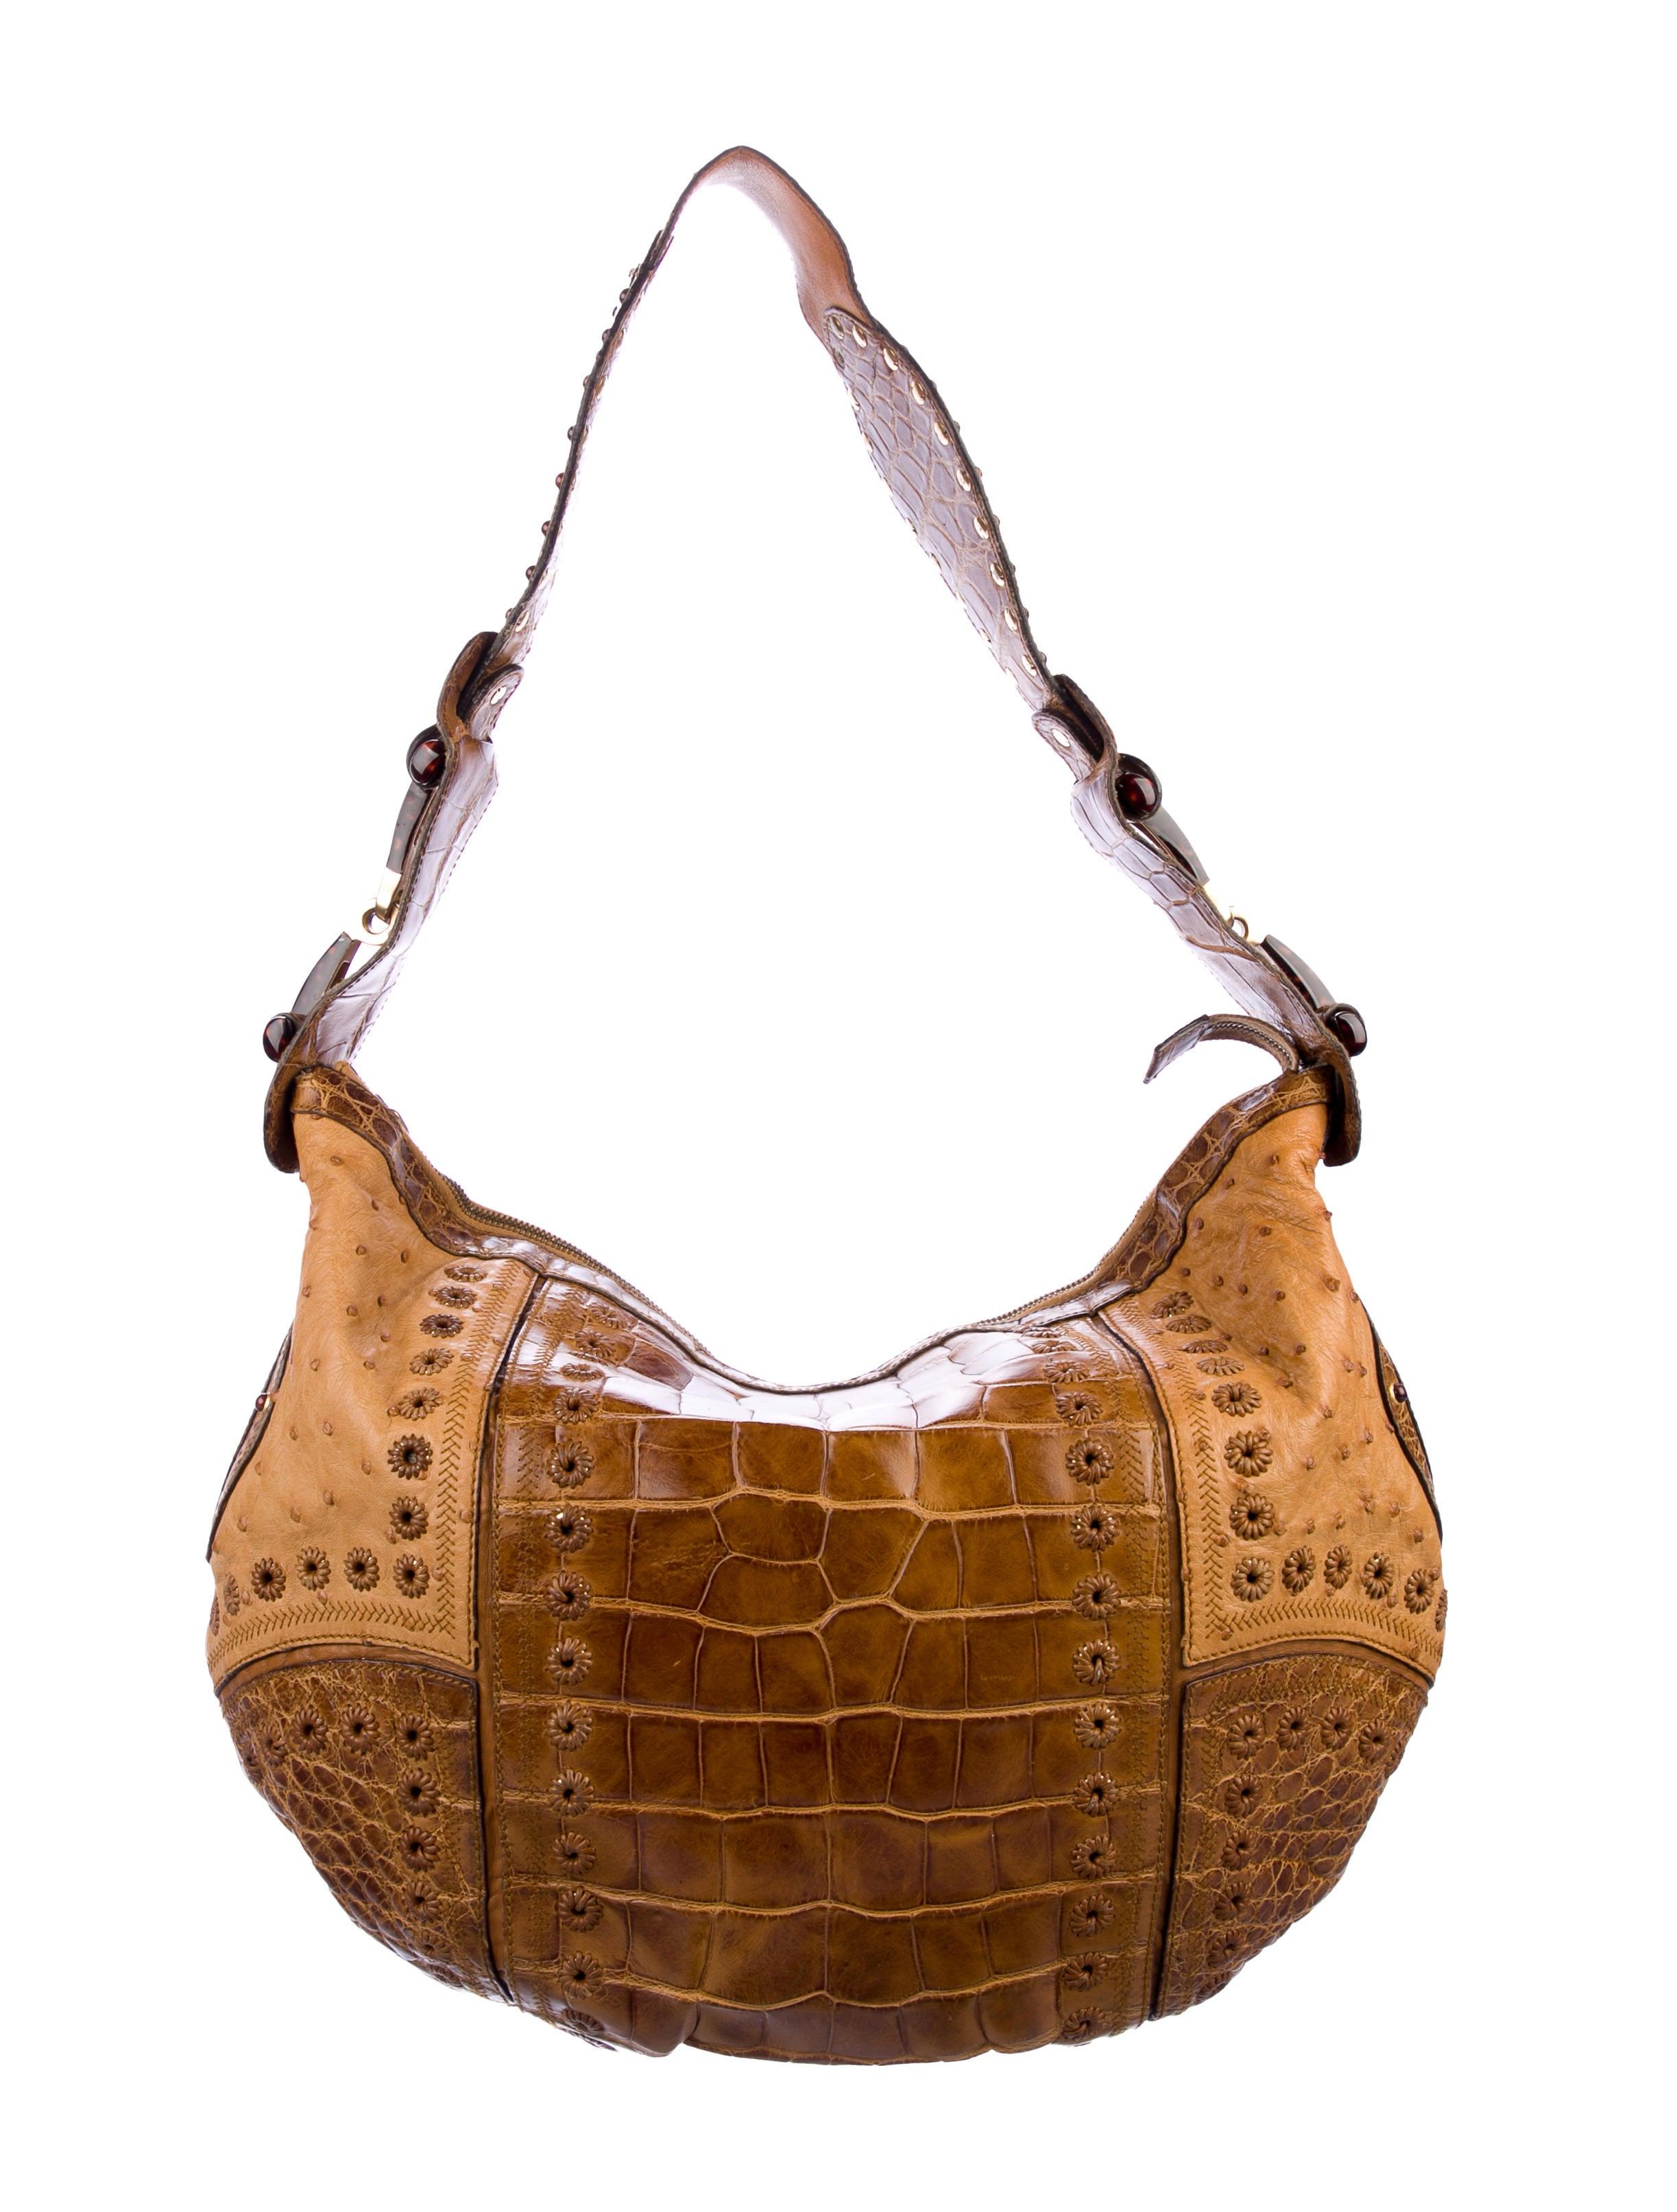 36231683b7f Gucci Ostrich and Crocodile Pelham Hobo - Handbags - GUC297002